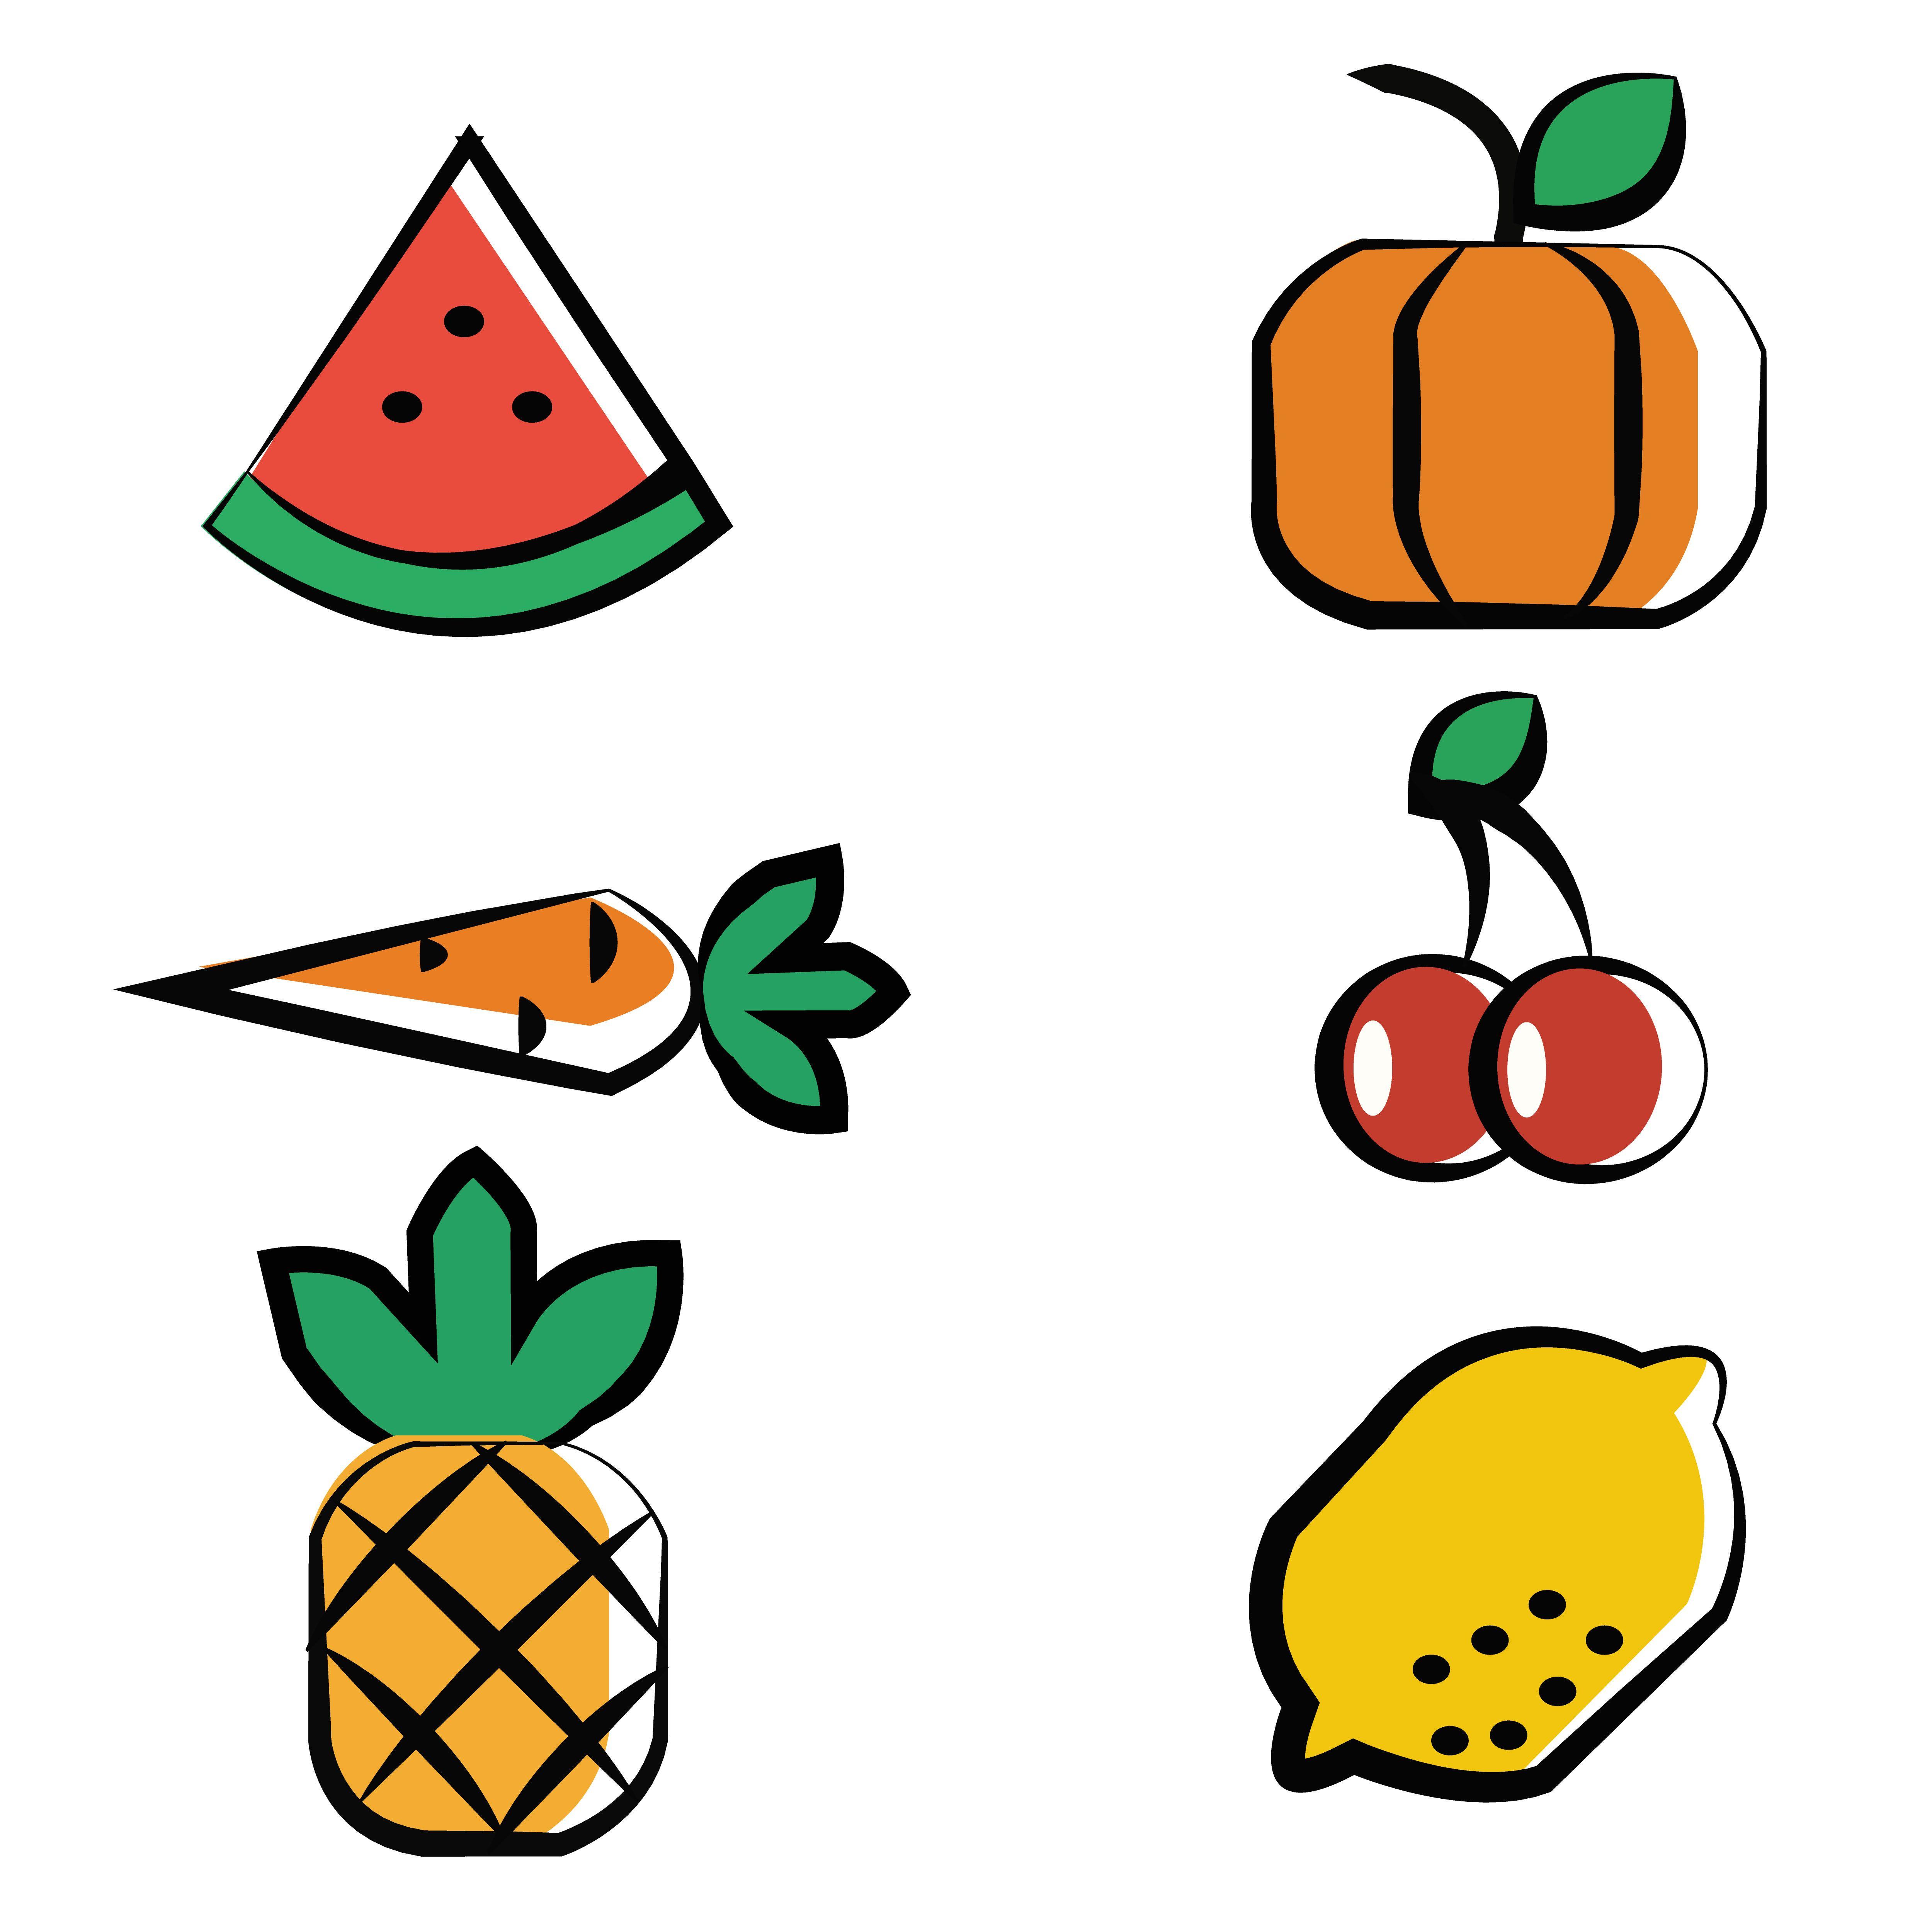 apple; cheery; banana; lemon; orange; strawberry; pear